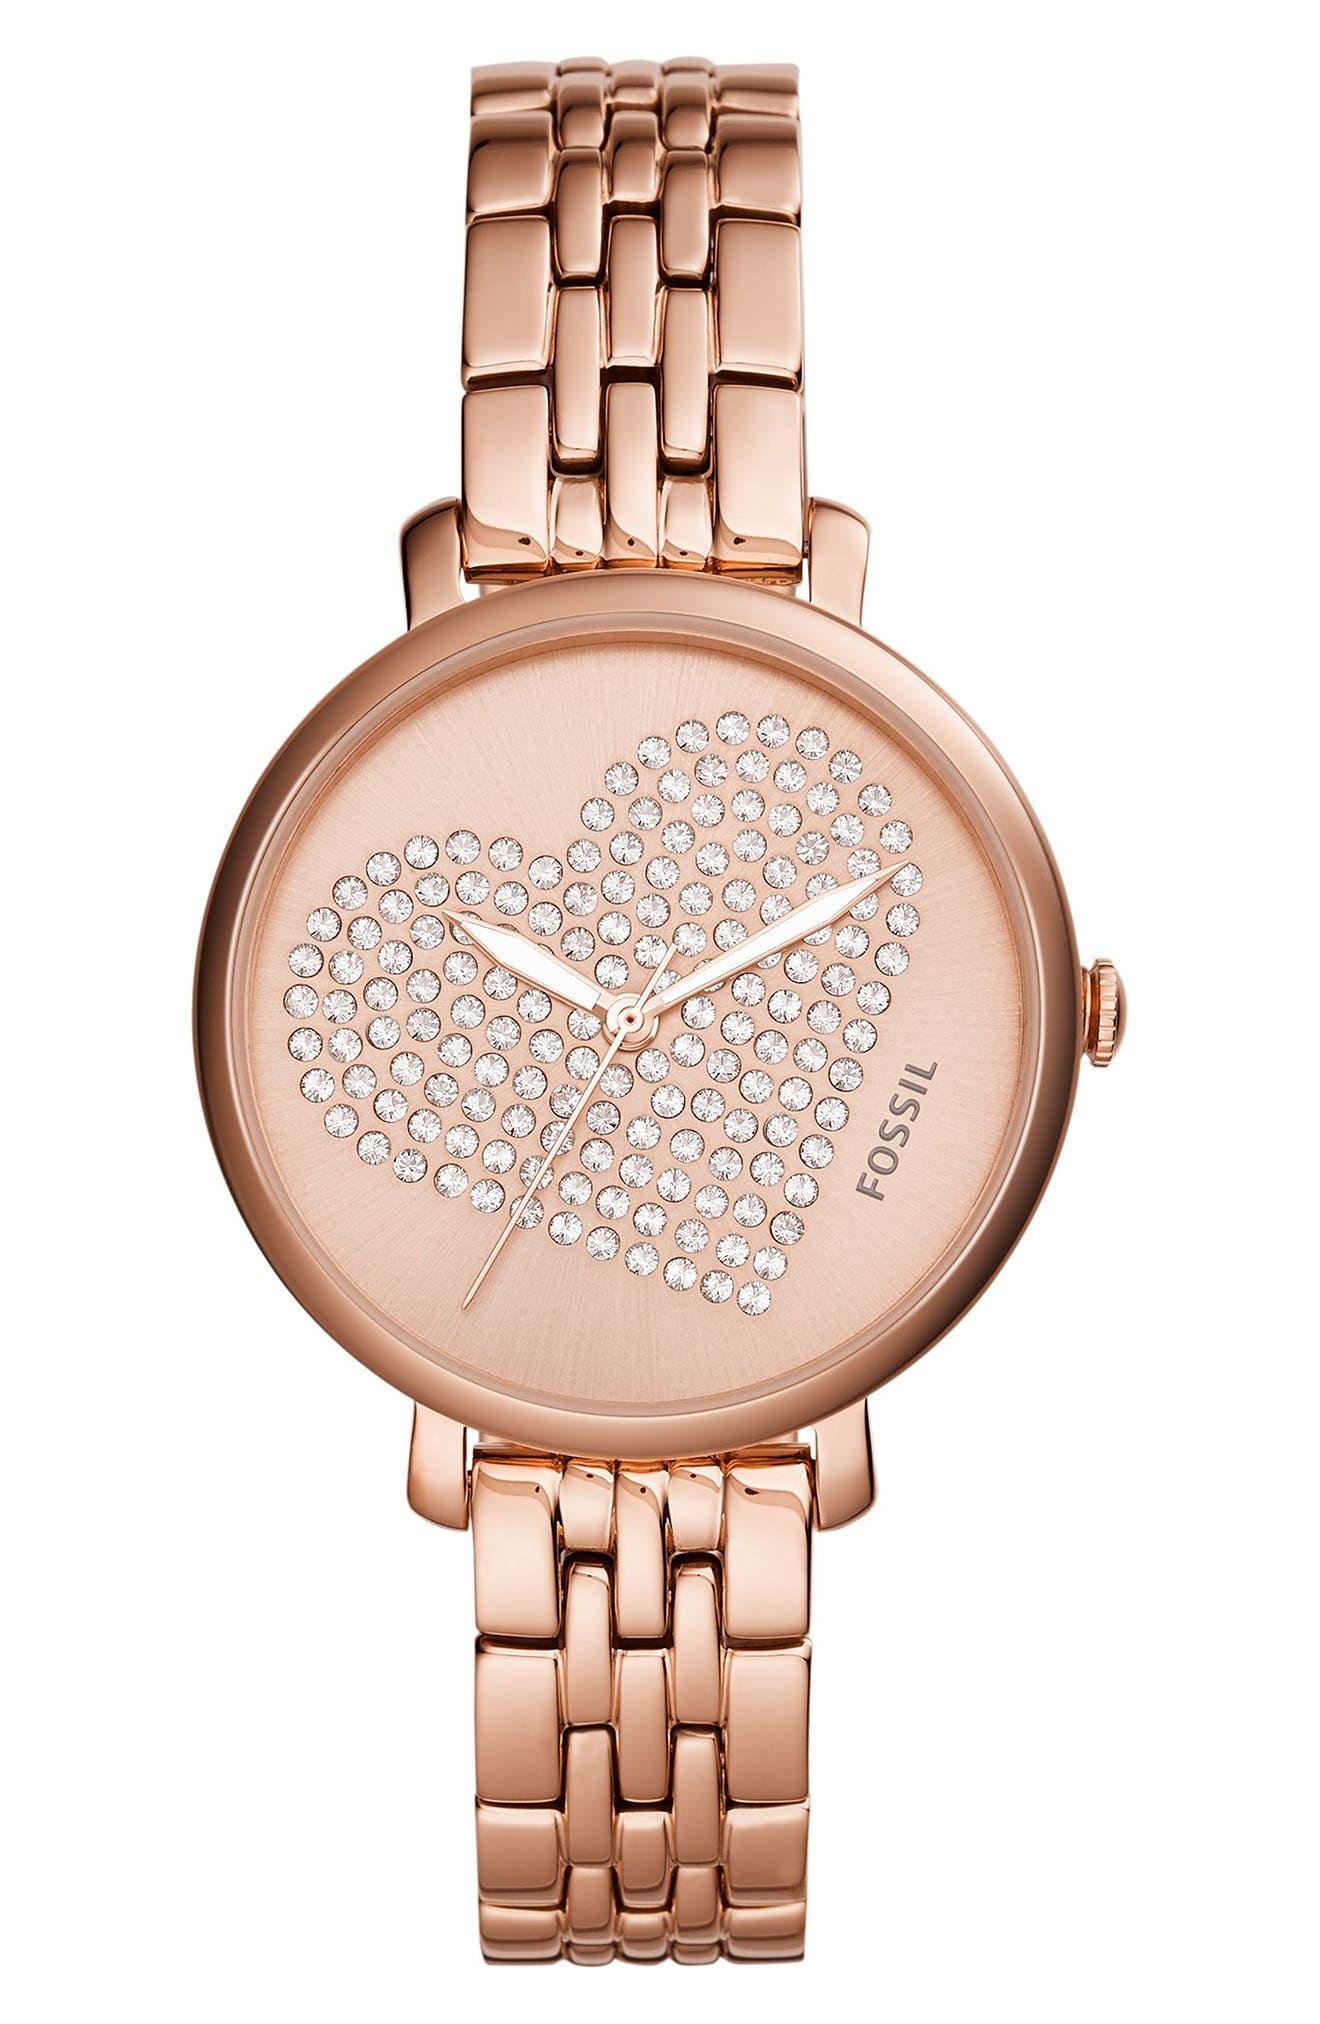 Main Image - Fossil Jacqueline Crystal Heart Bracelet Watch, 36mm